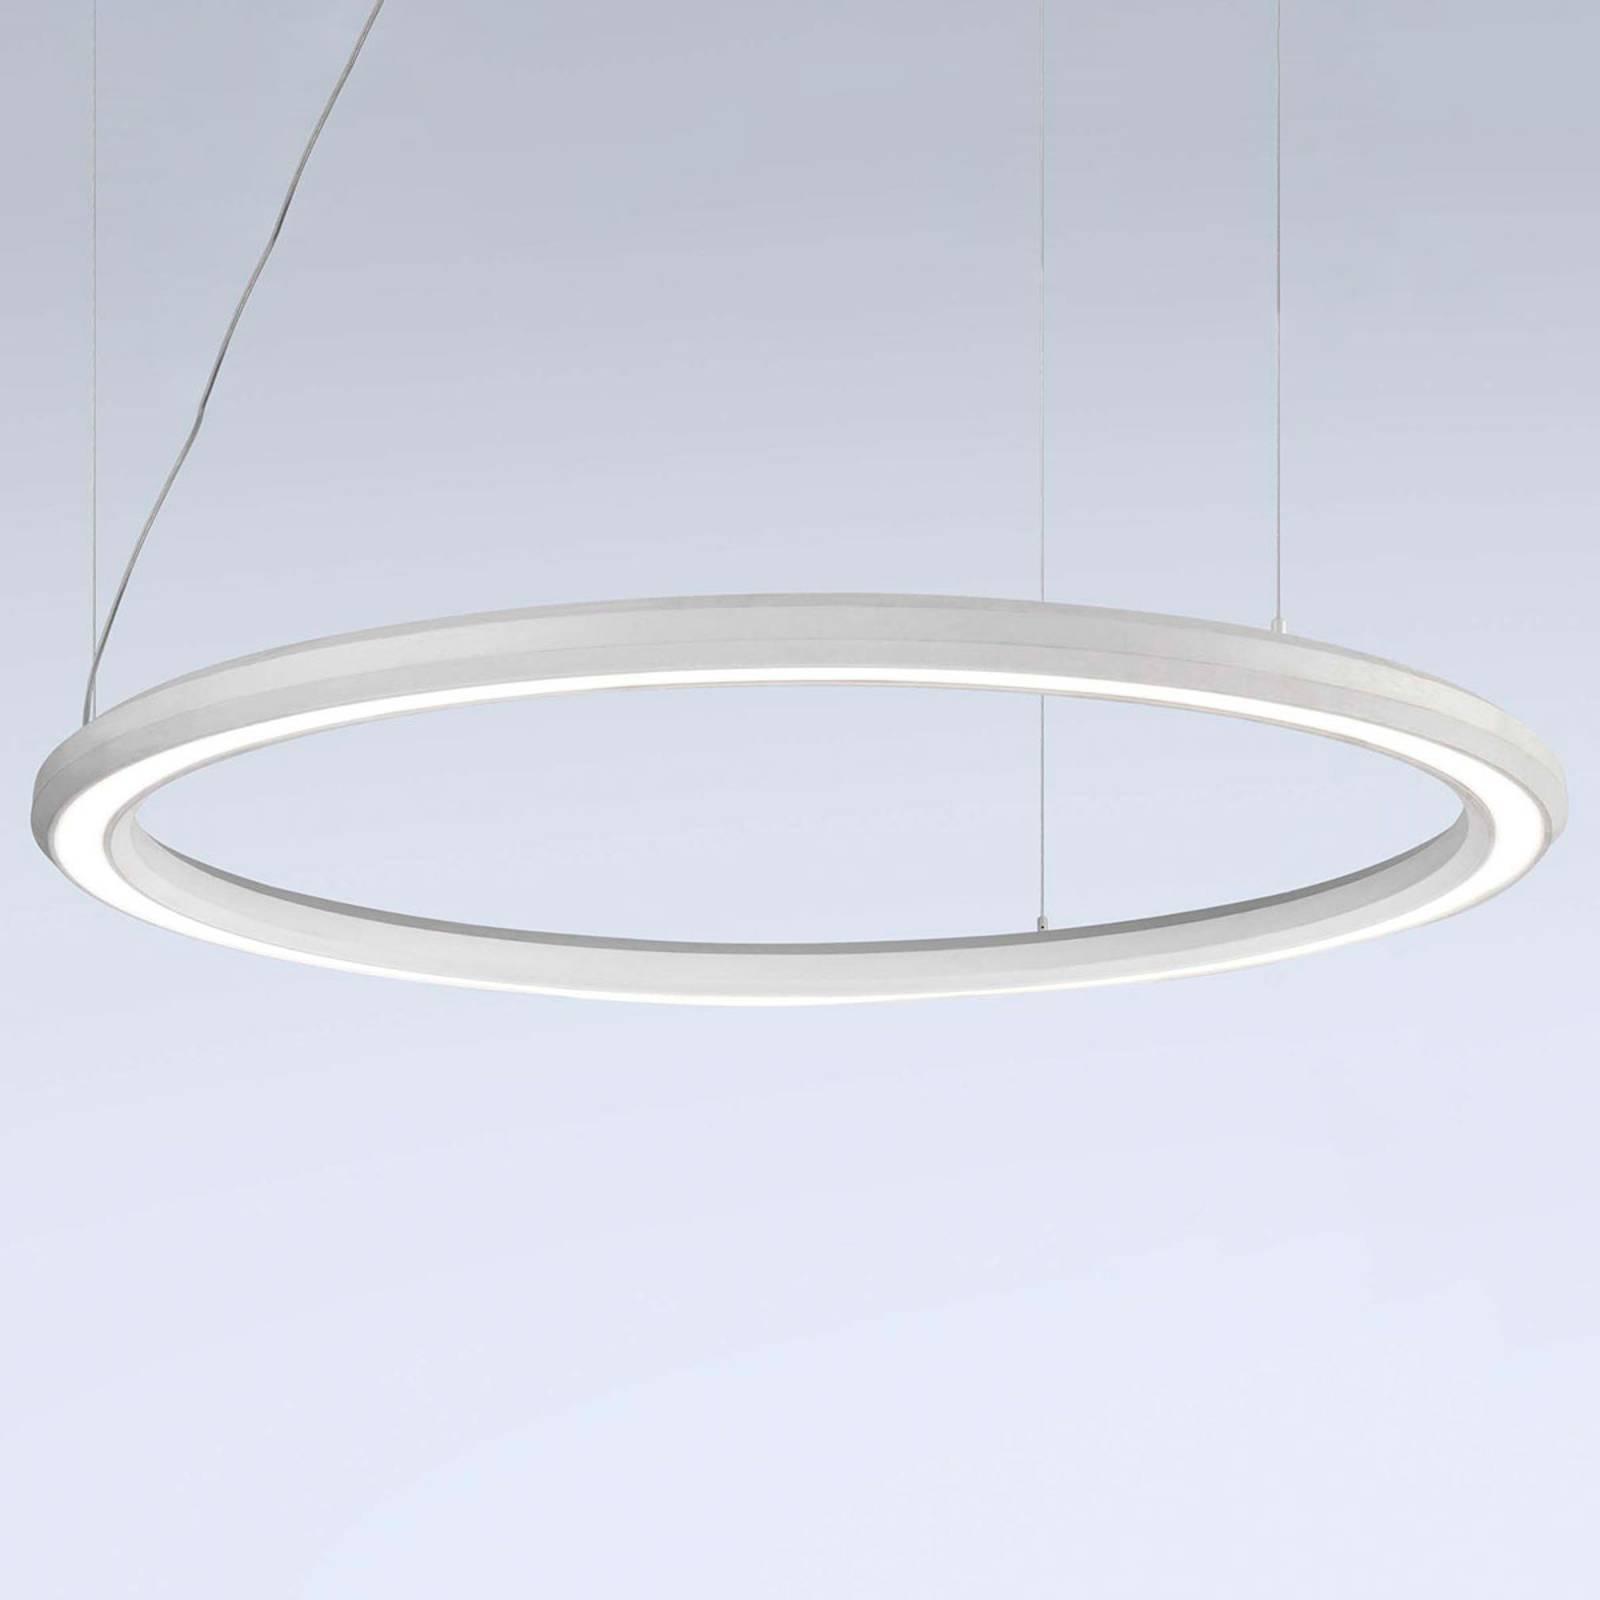 LED hanglamp Materica onder Ø 120 cm wit